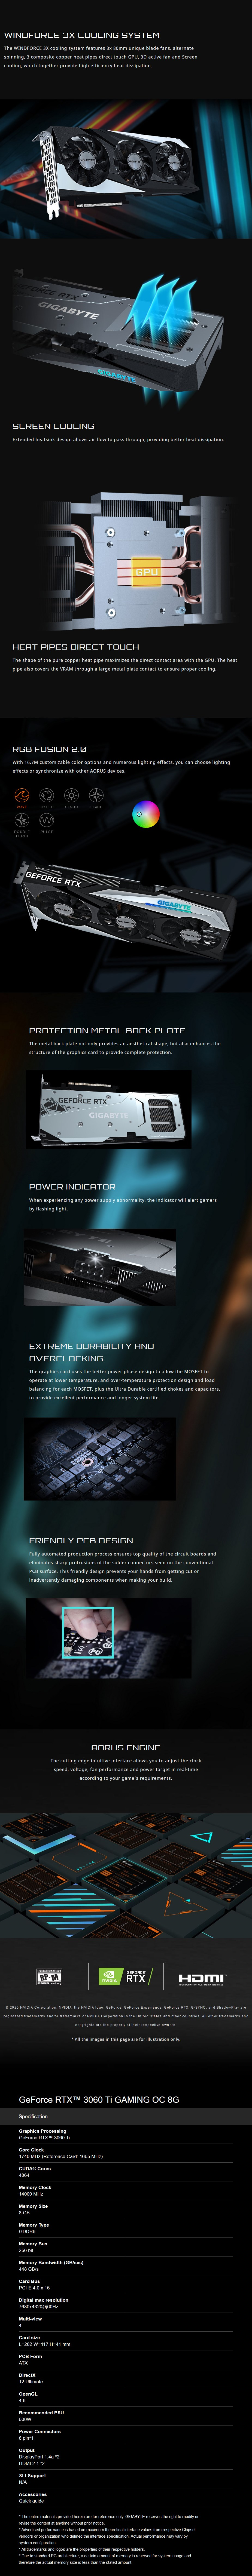 gigabyte-geforce-rtx-3060-ti-gaming-oc-8gb-video-card-ac40254-10.jpg